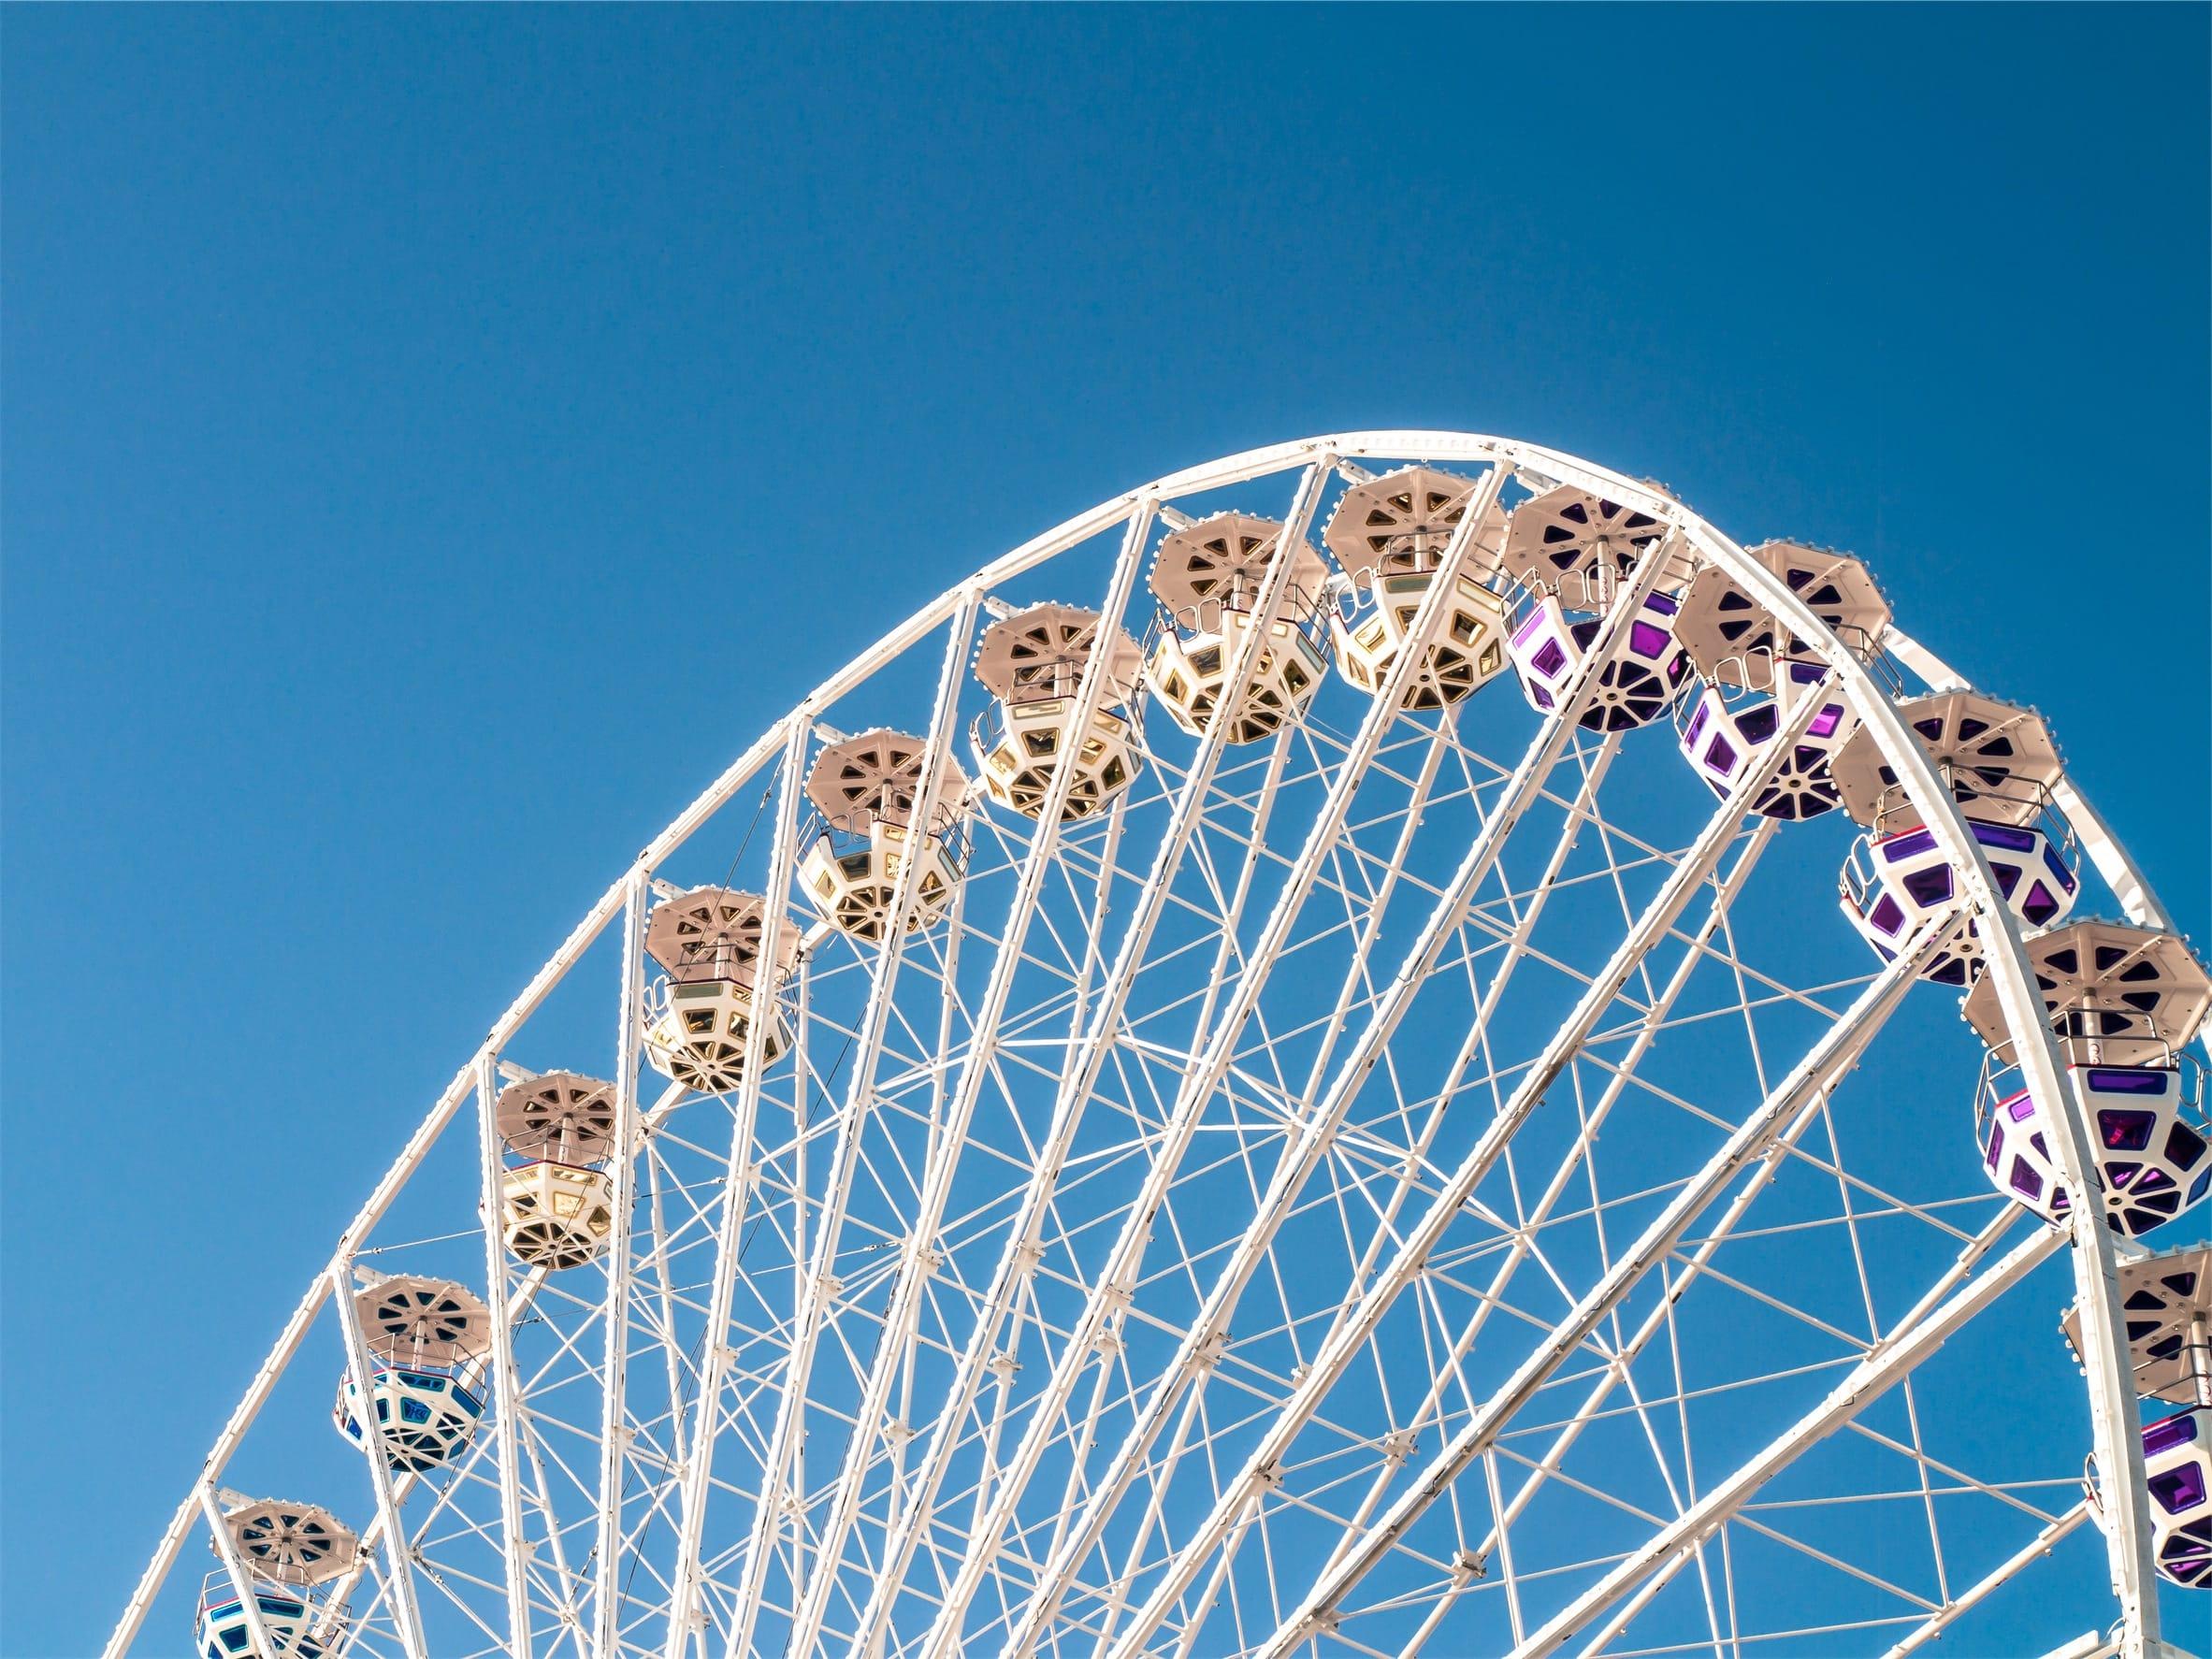 Amusement park Ferris wheel